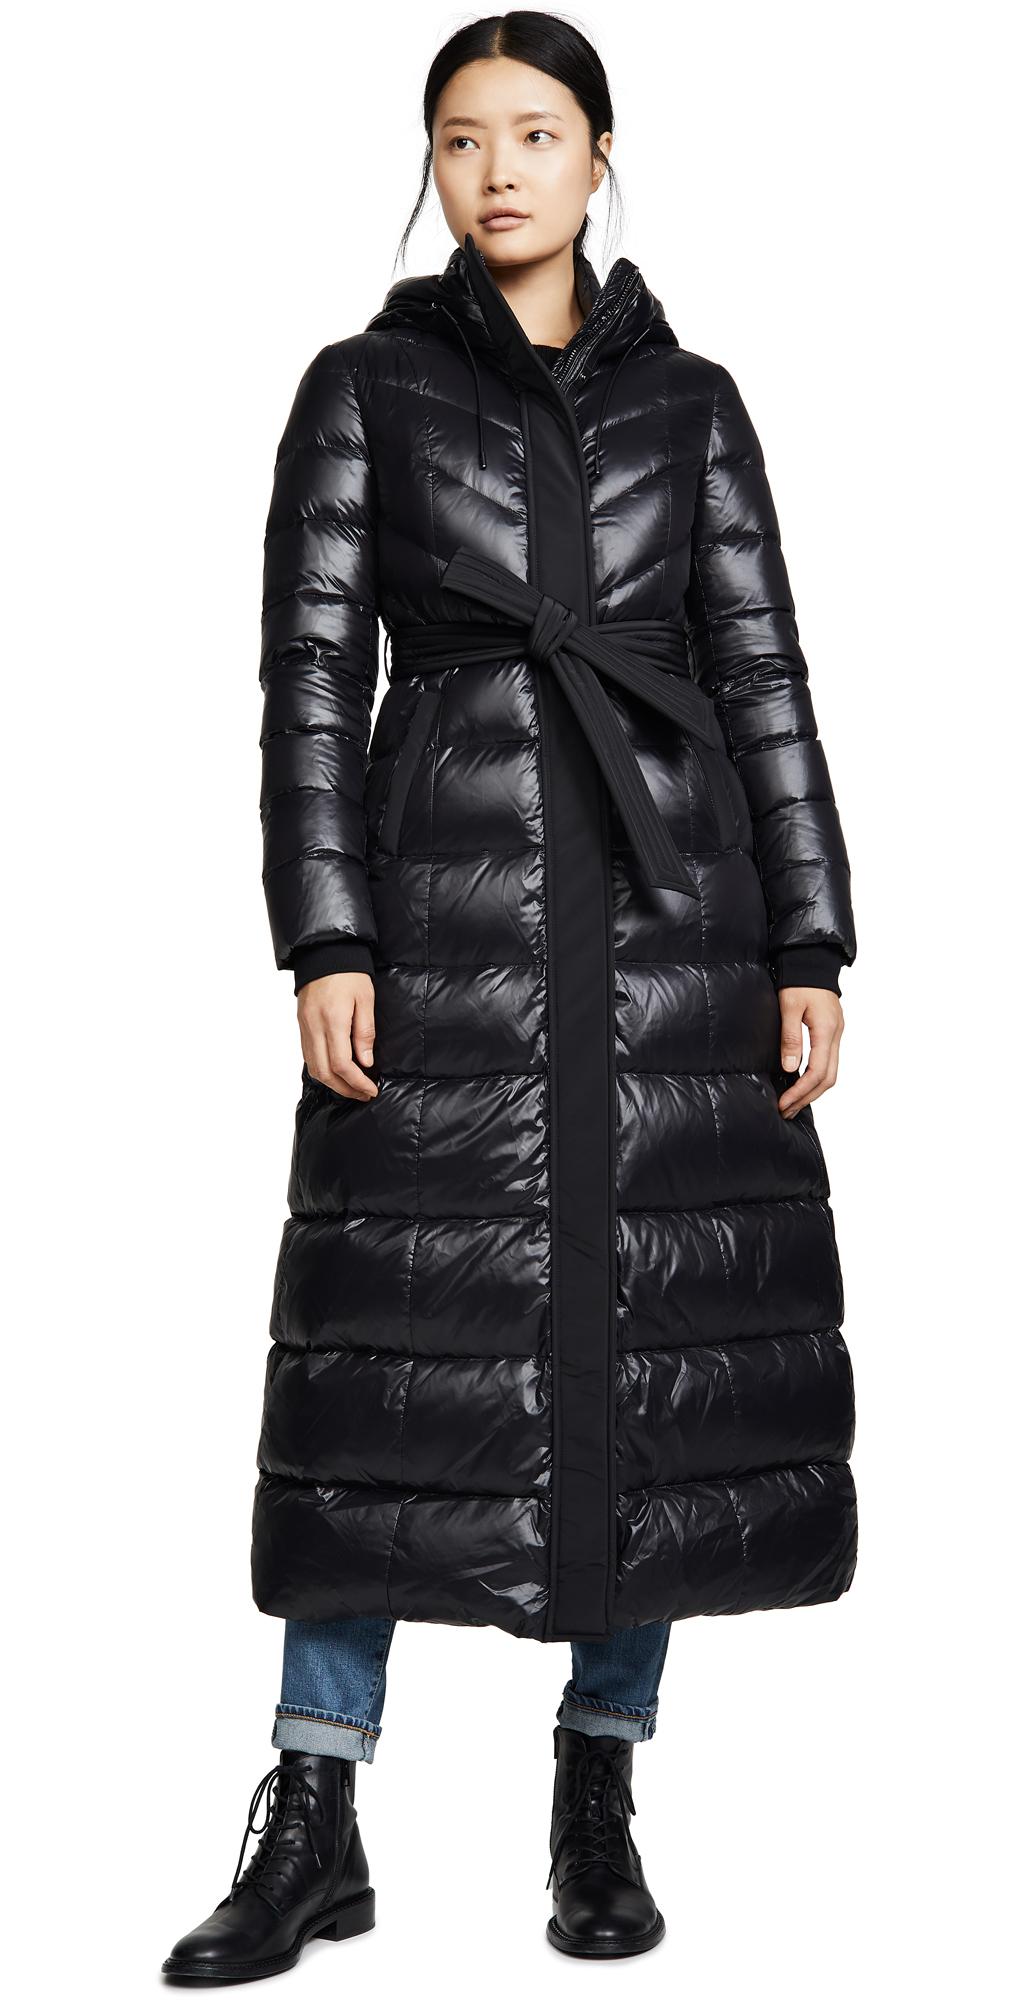 Mackage Calina Jacket